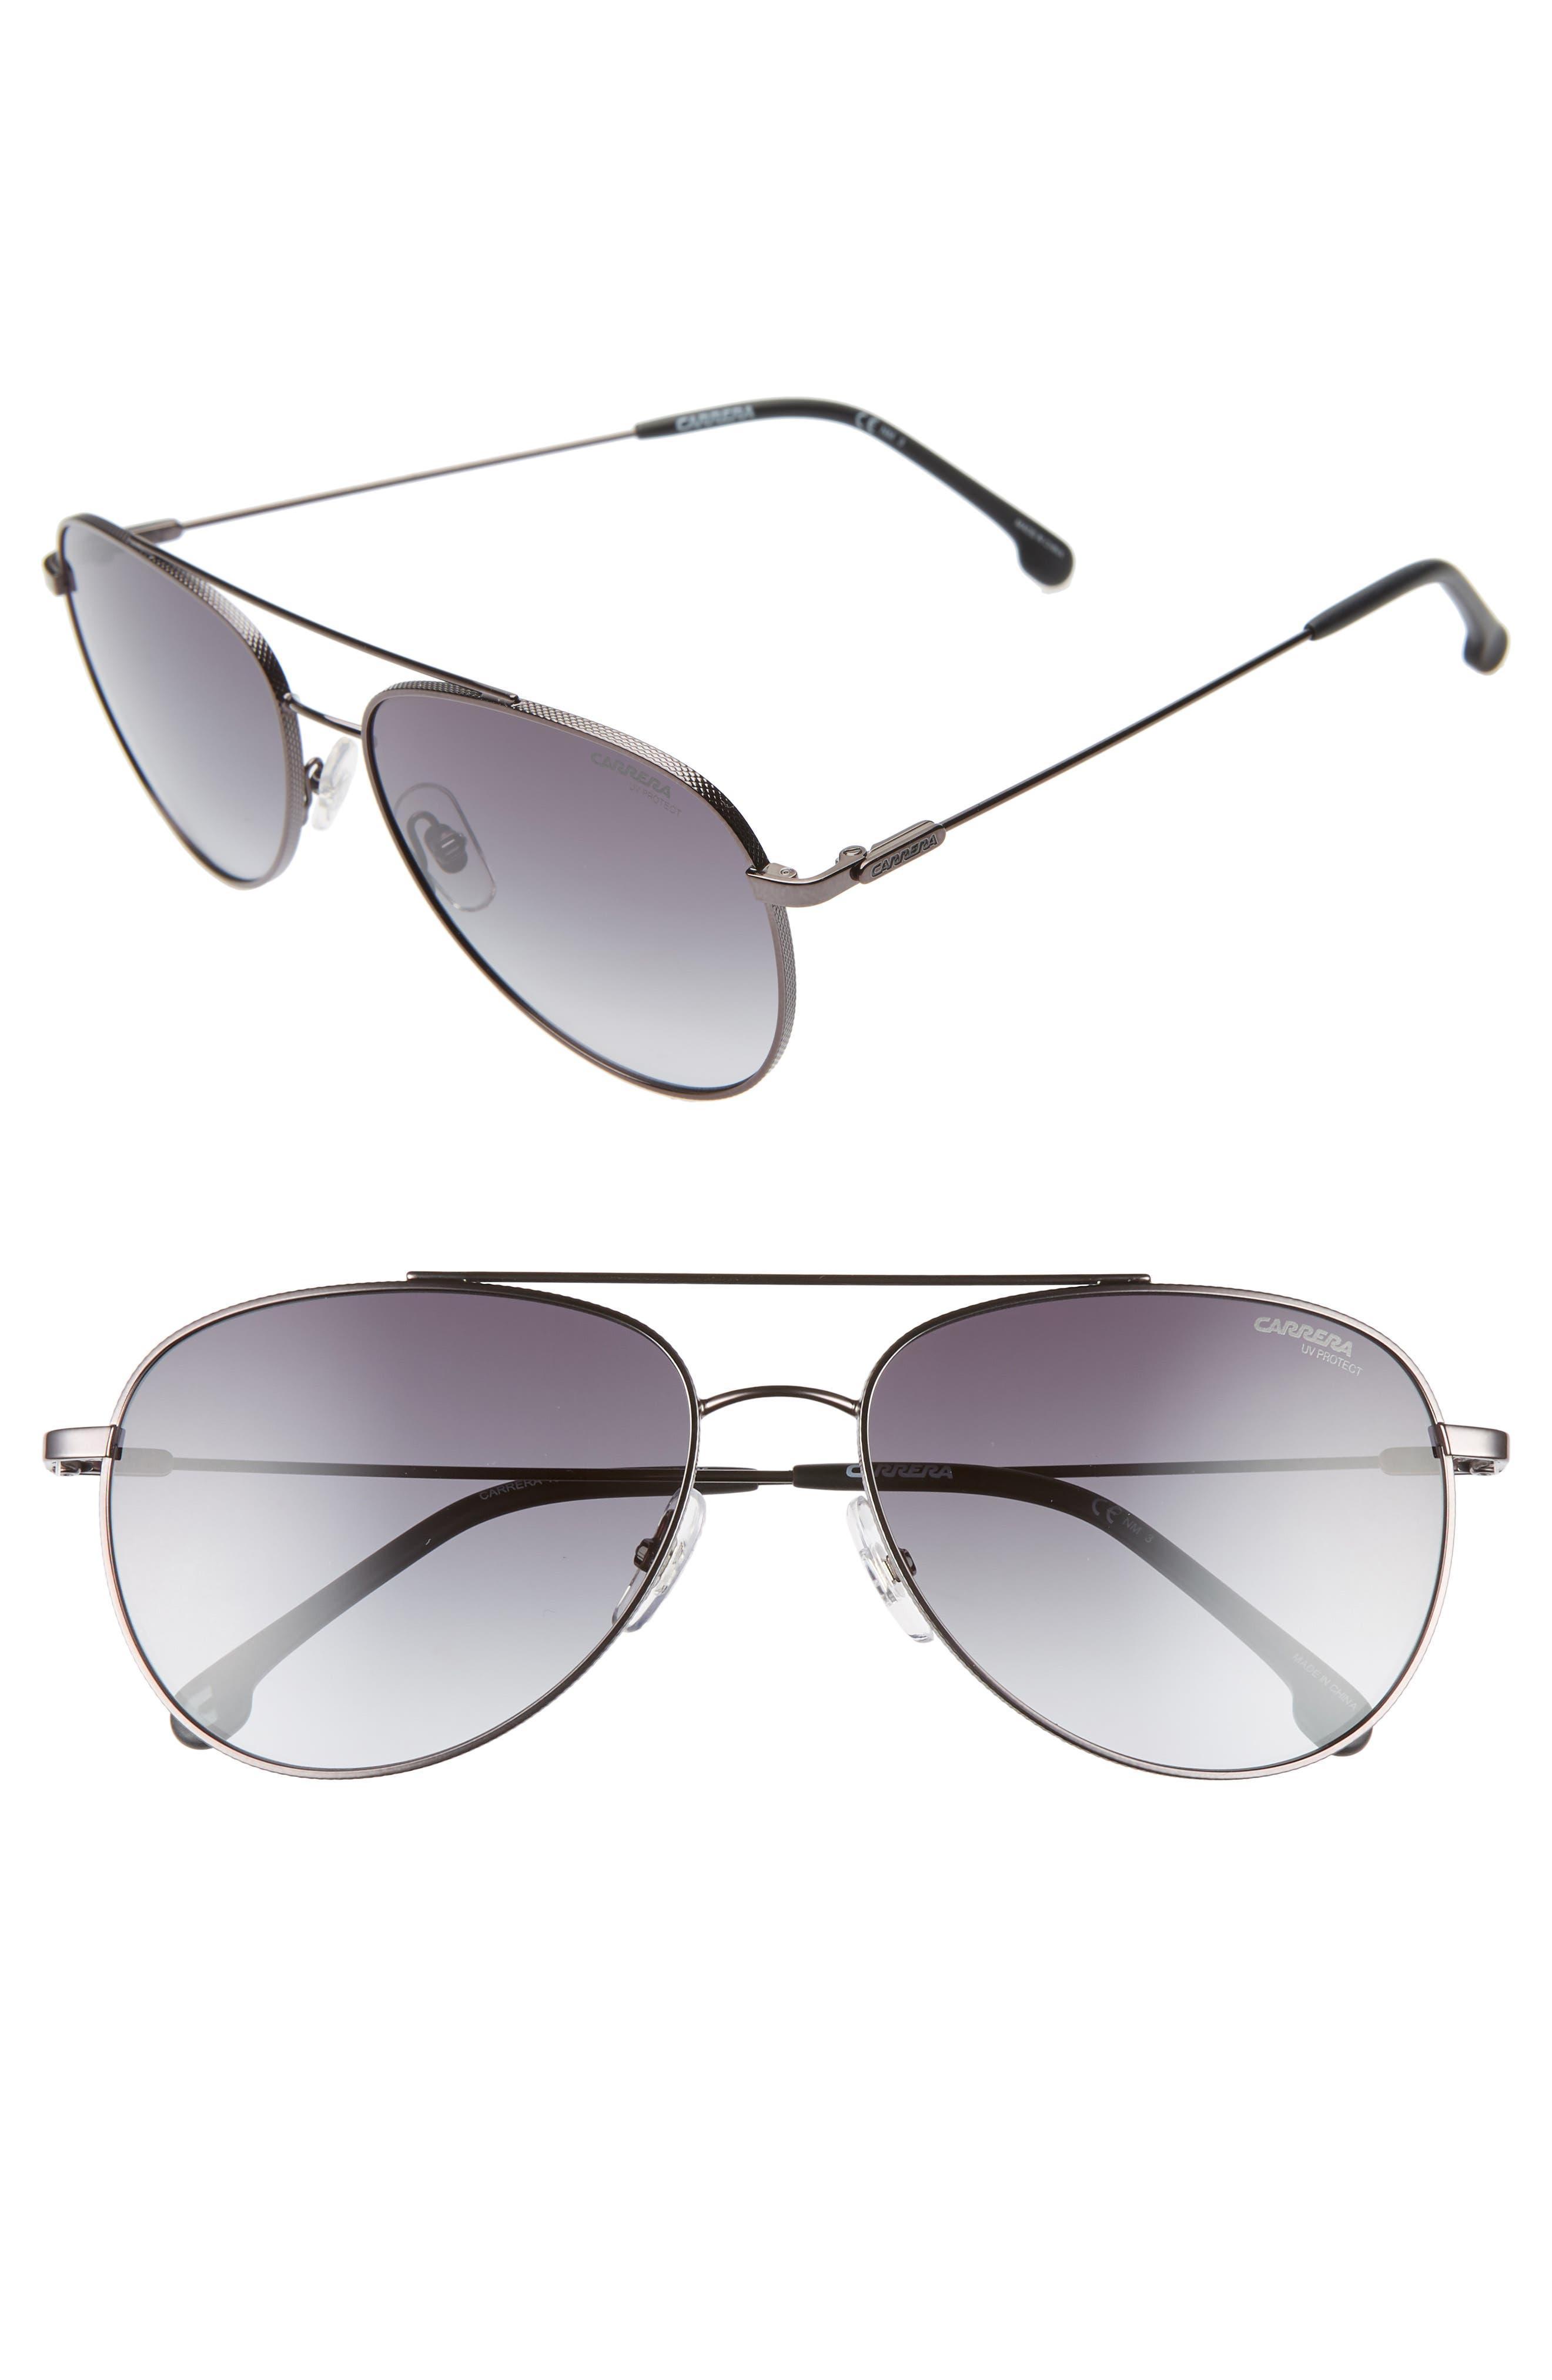 Carrera Eyewear 60Mm Aviator Sunglasses - Dark Ruthenium Black